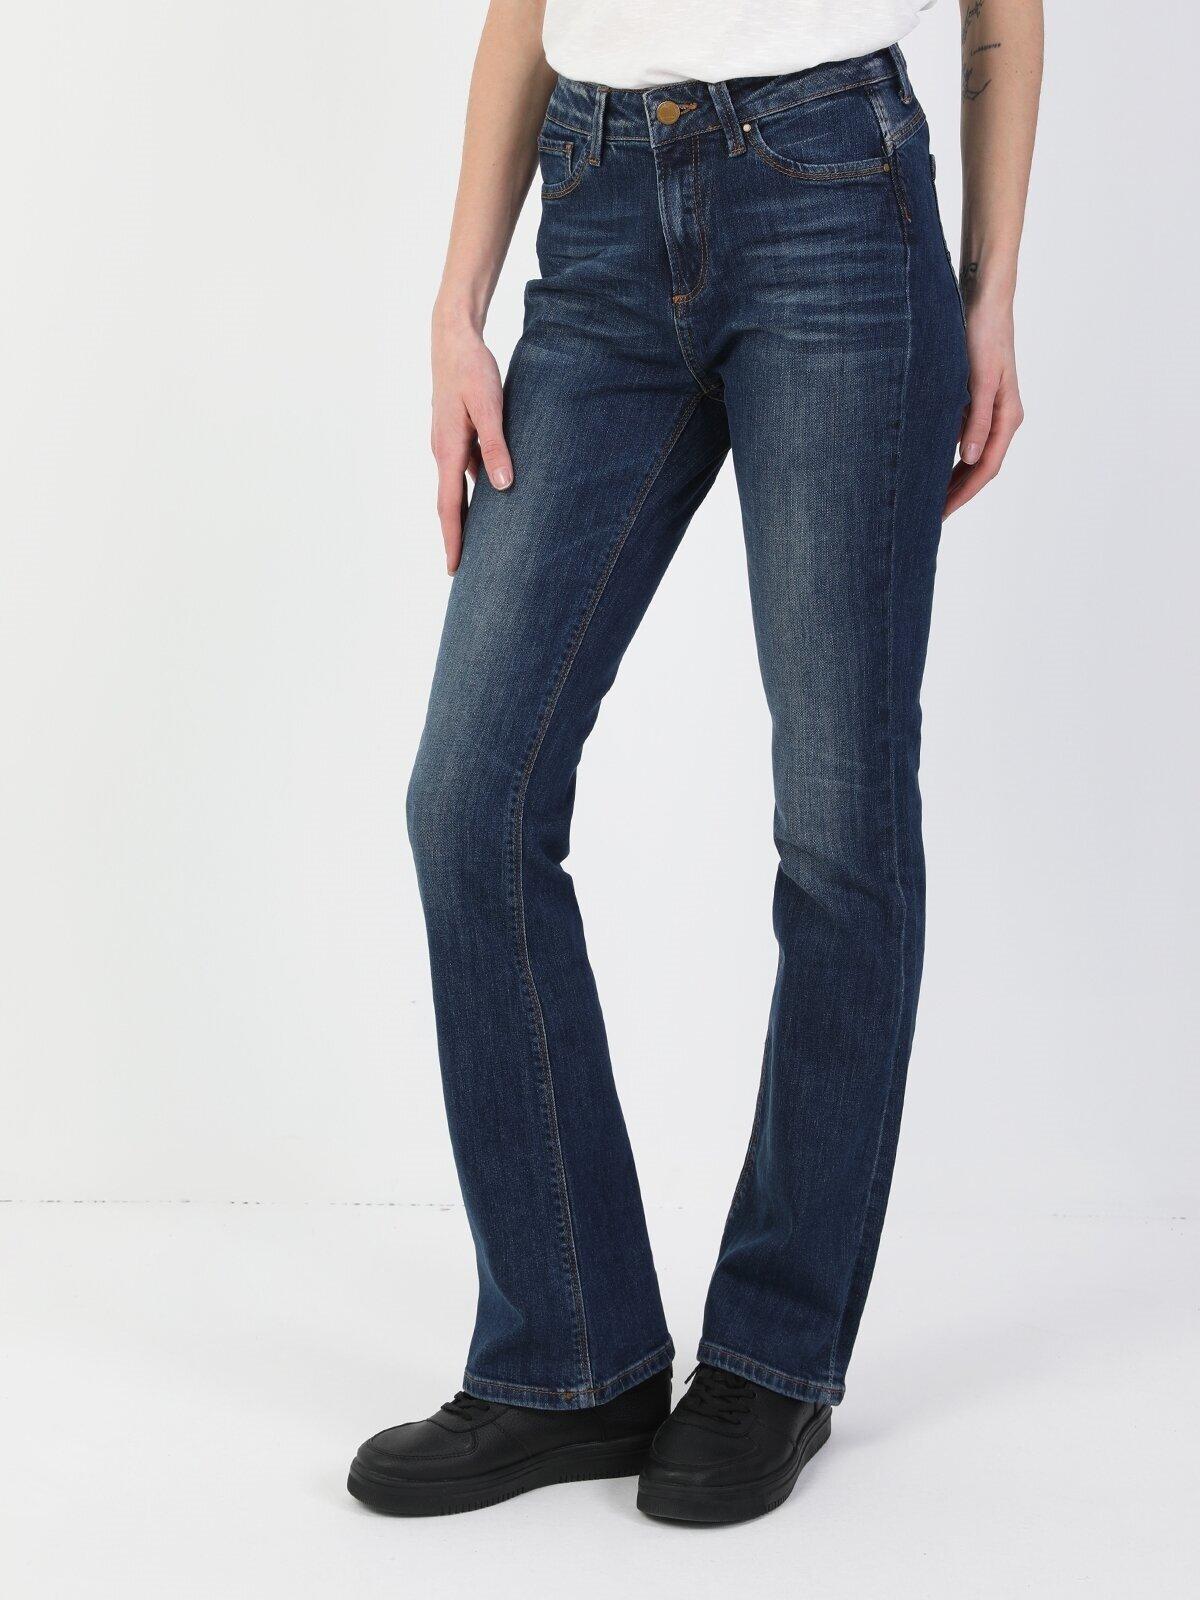 791 Monıca Orta Bel Rahat Paça Regular Fit Koyu Mavi Kadın Jean Pantolon